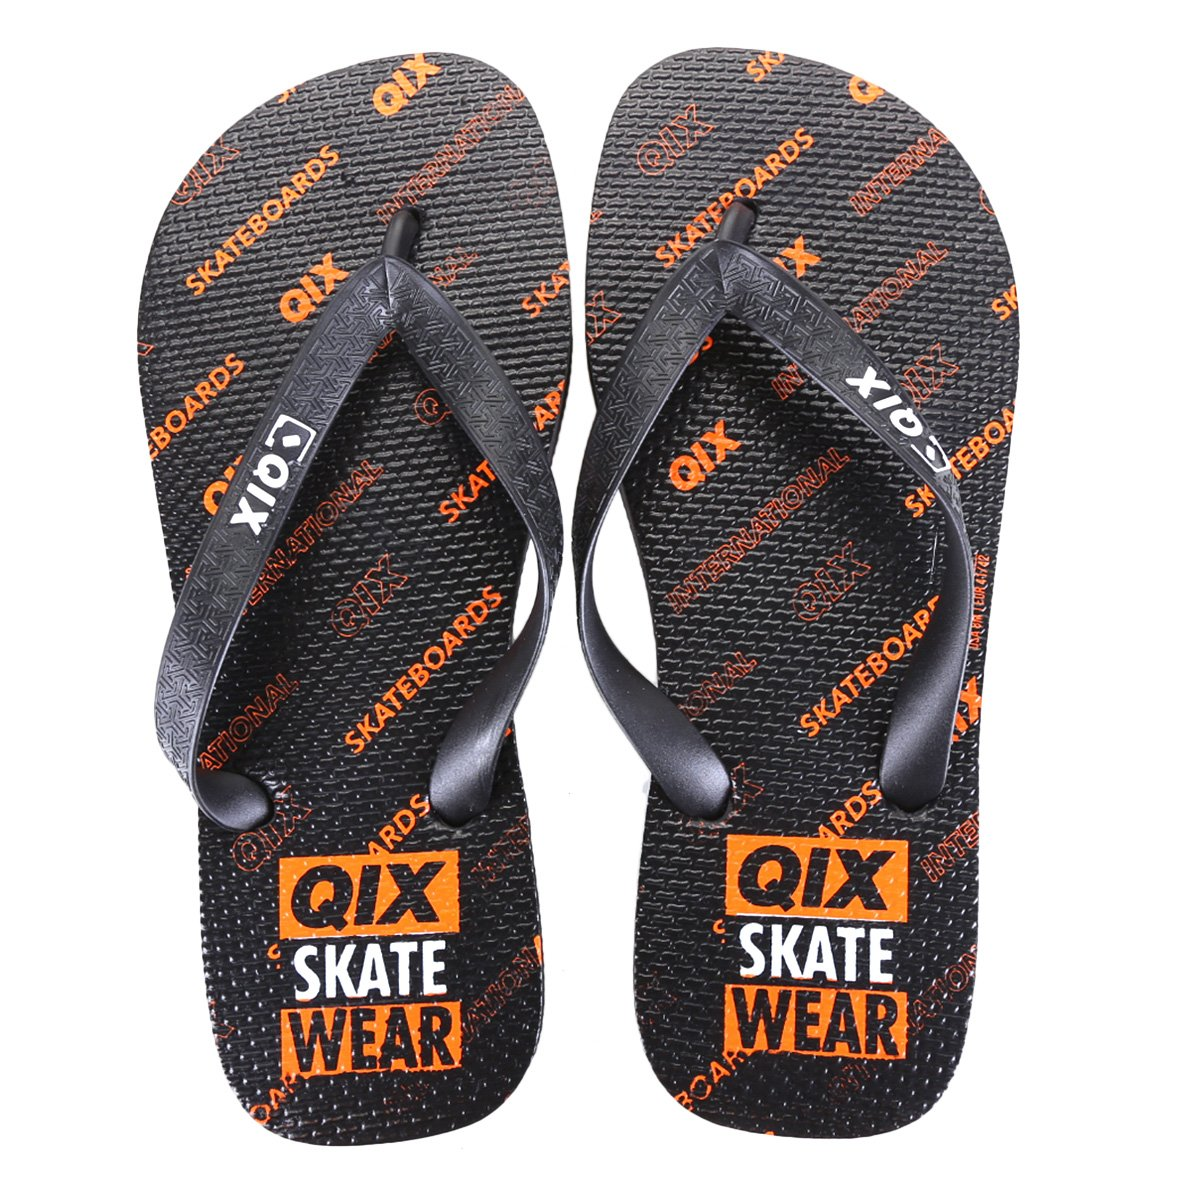 Chinelo Qix Skate Wear Masculino